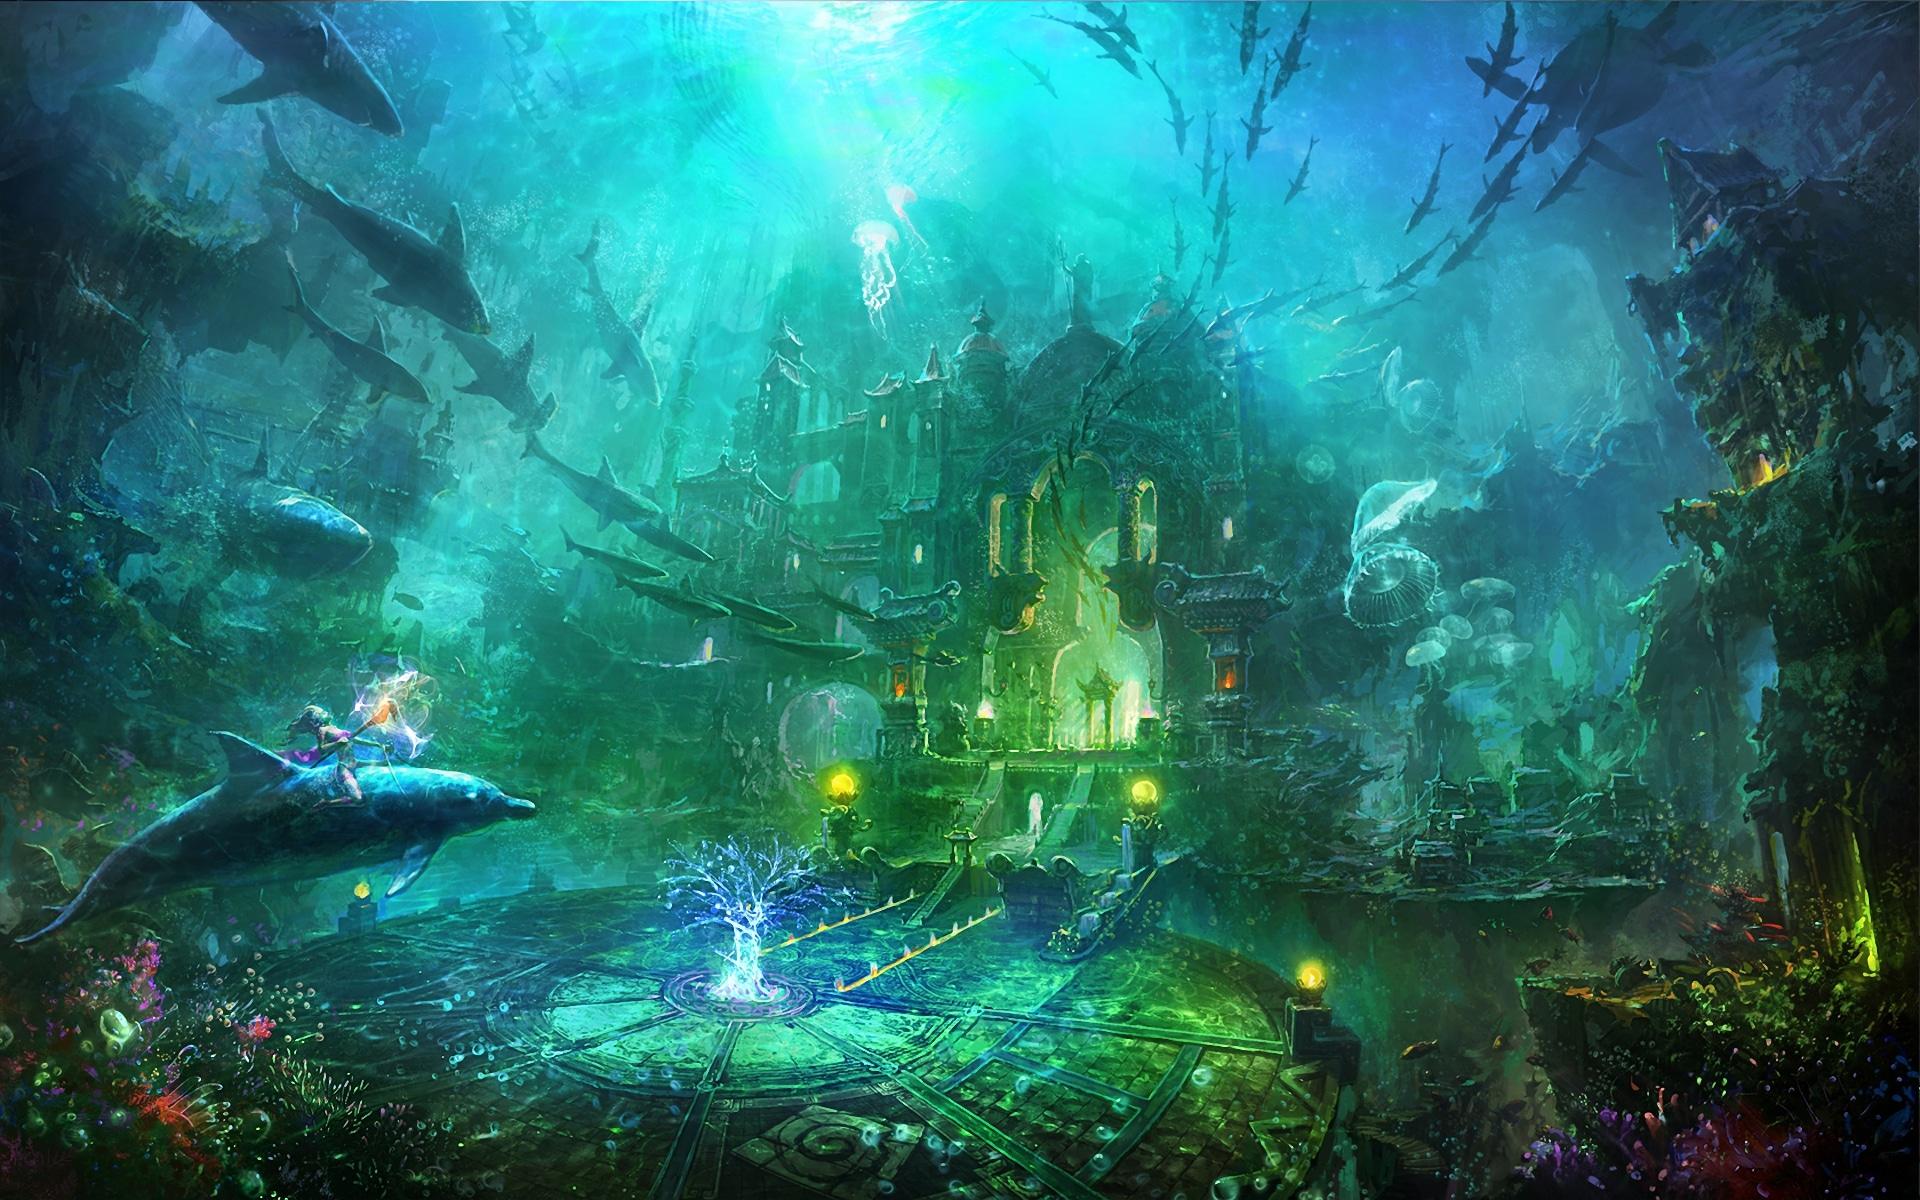 Cidade perdida embaixo d'água